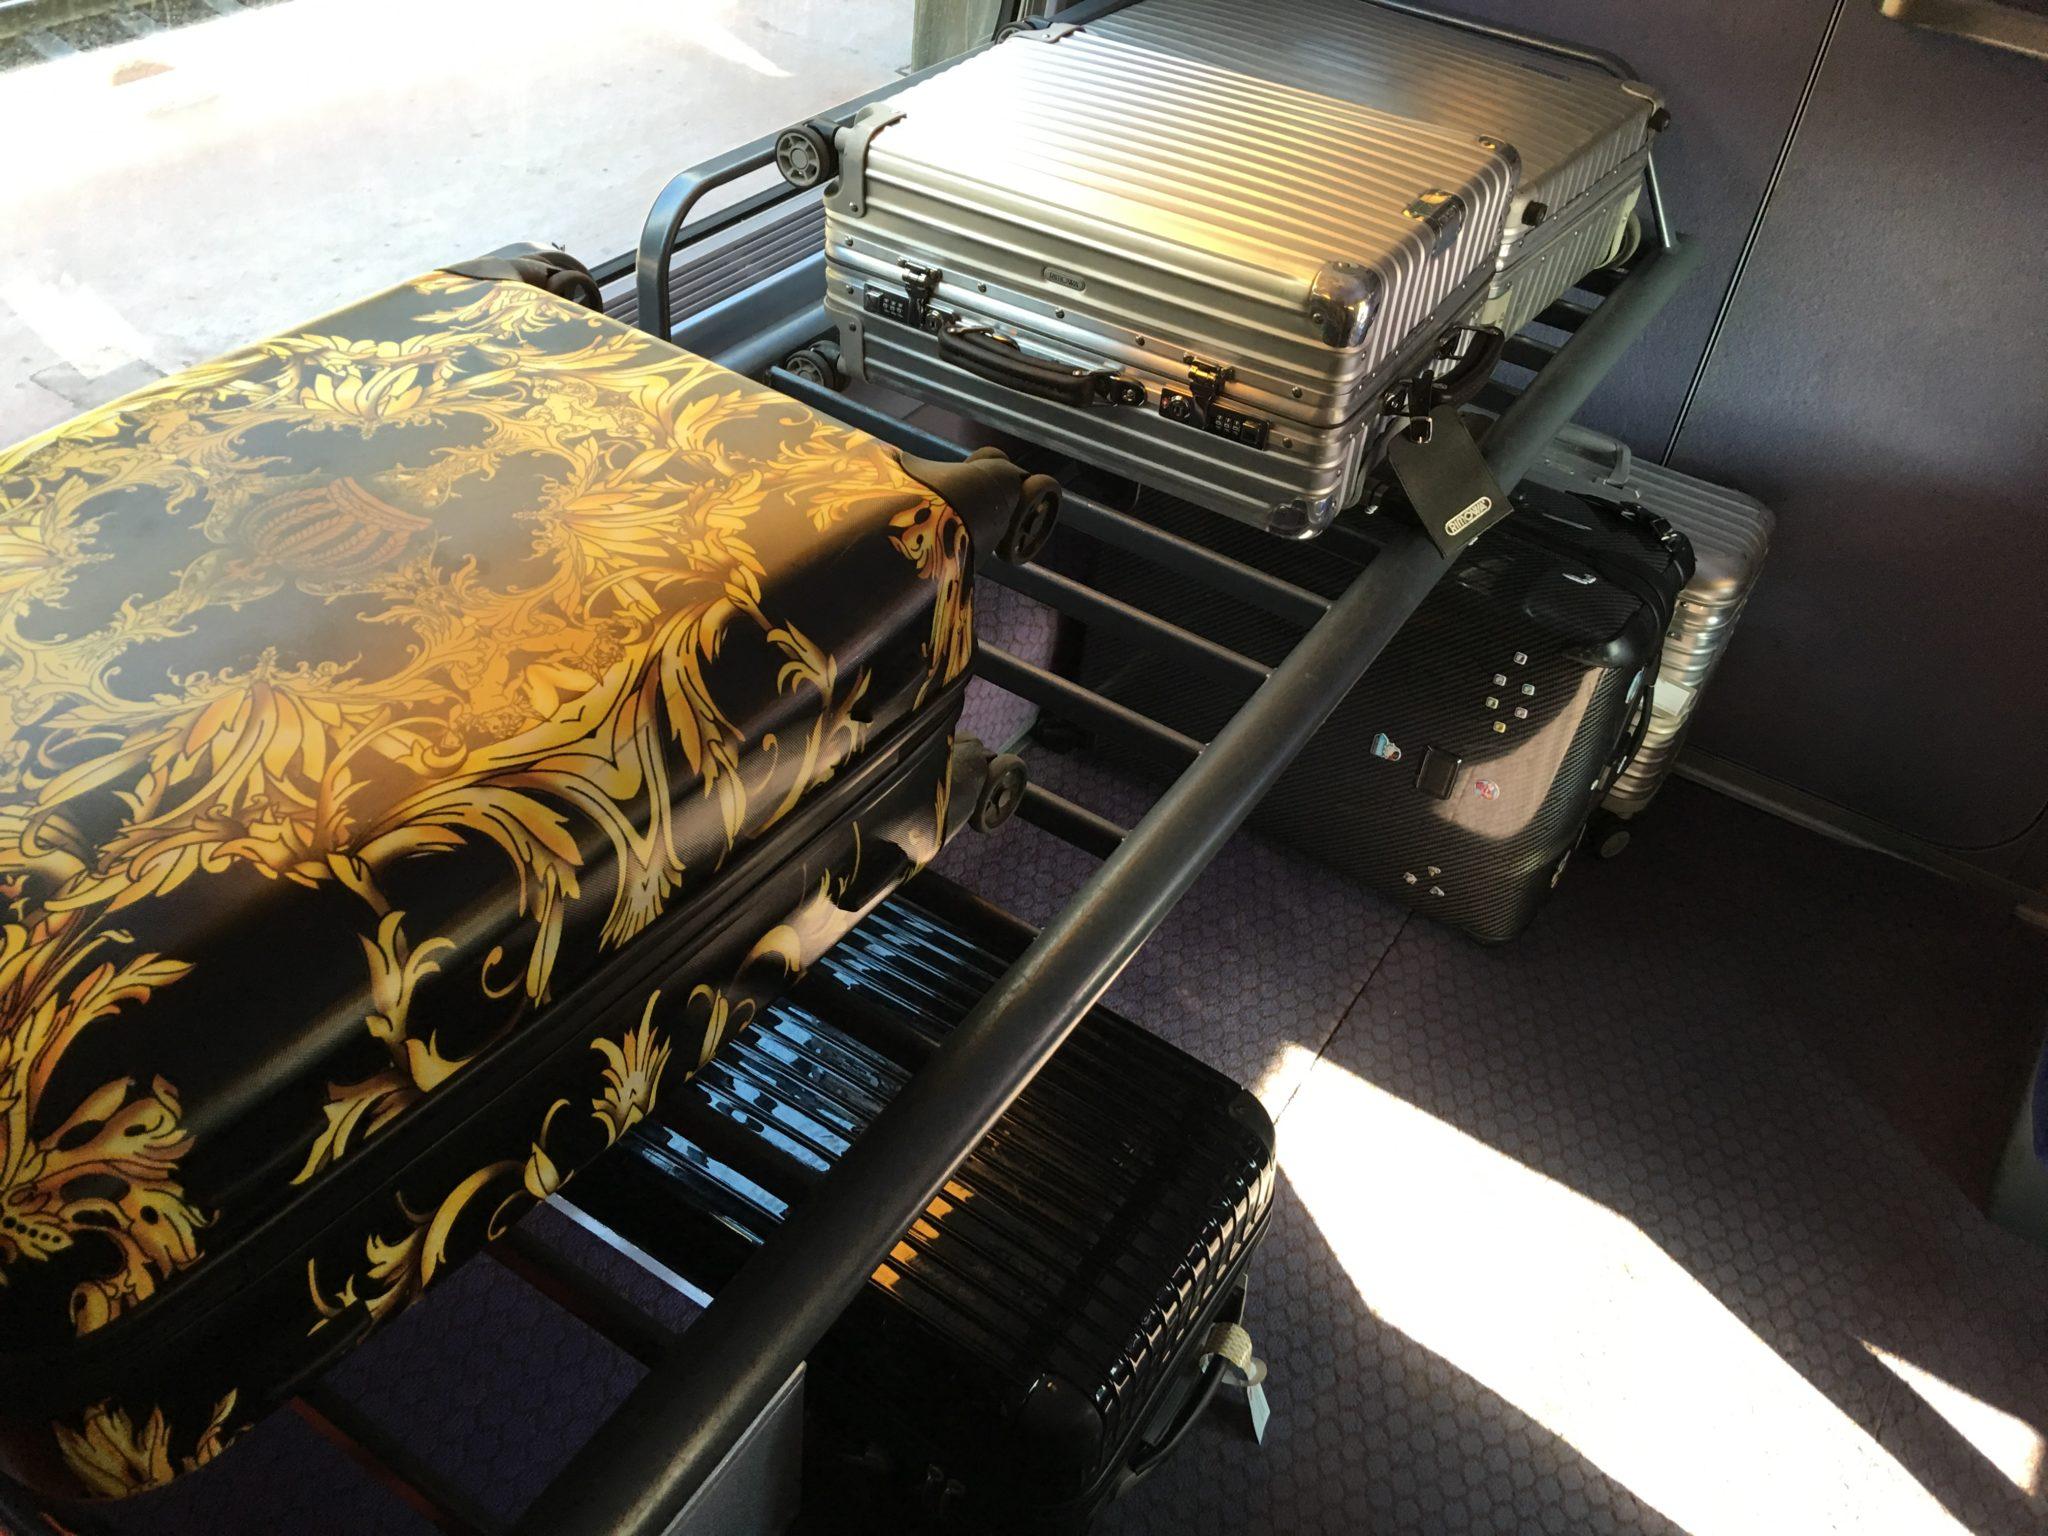 Spacious suitcase racks are a #PaxEx bonus for travellers. Image: John Walton